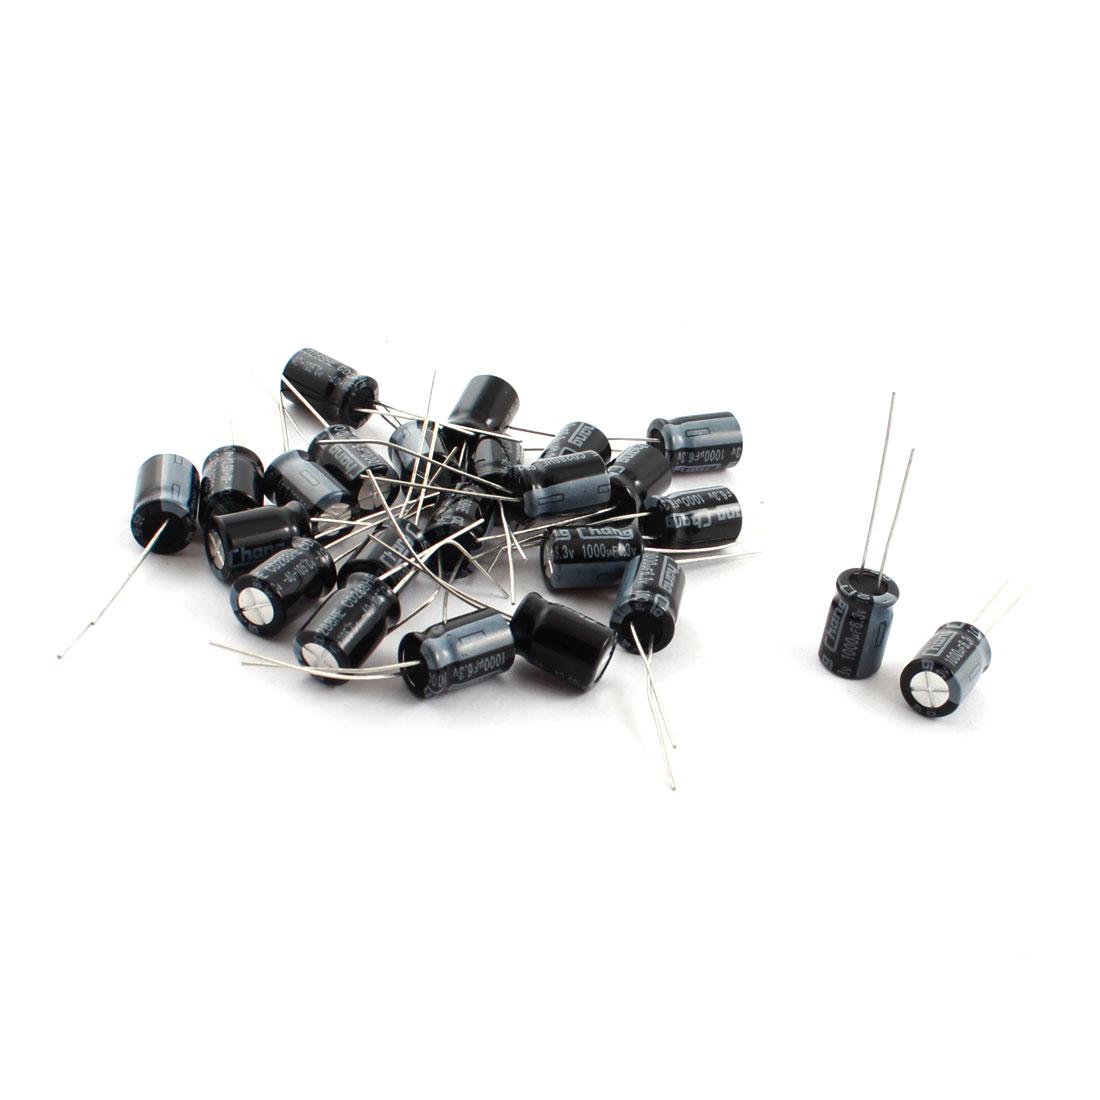 25 Pcs 1000uF 6.3V Radial Leads Aluminum Electrolytic Capacitors 8x12mm